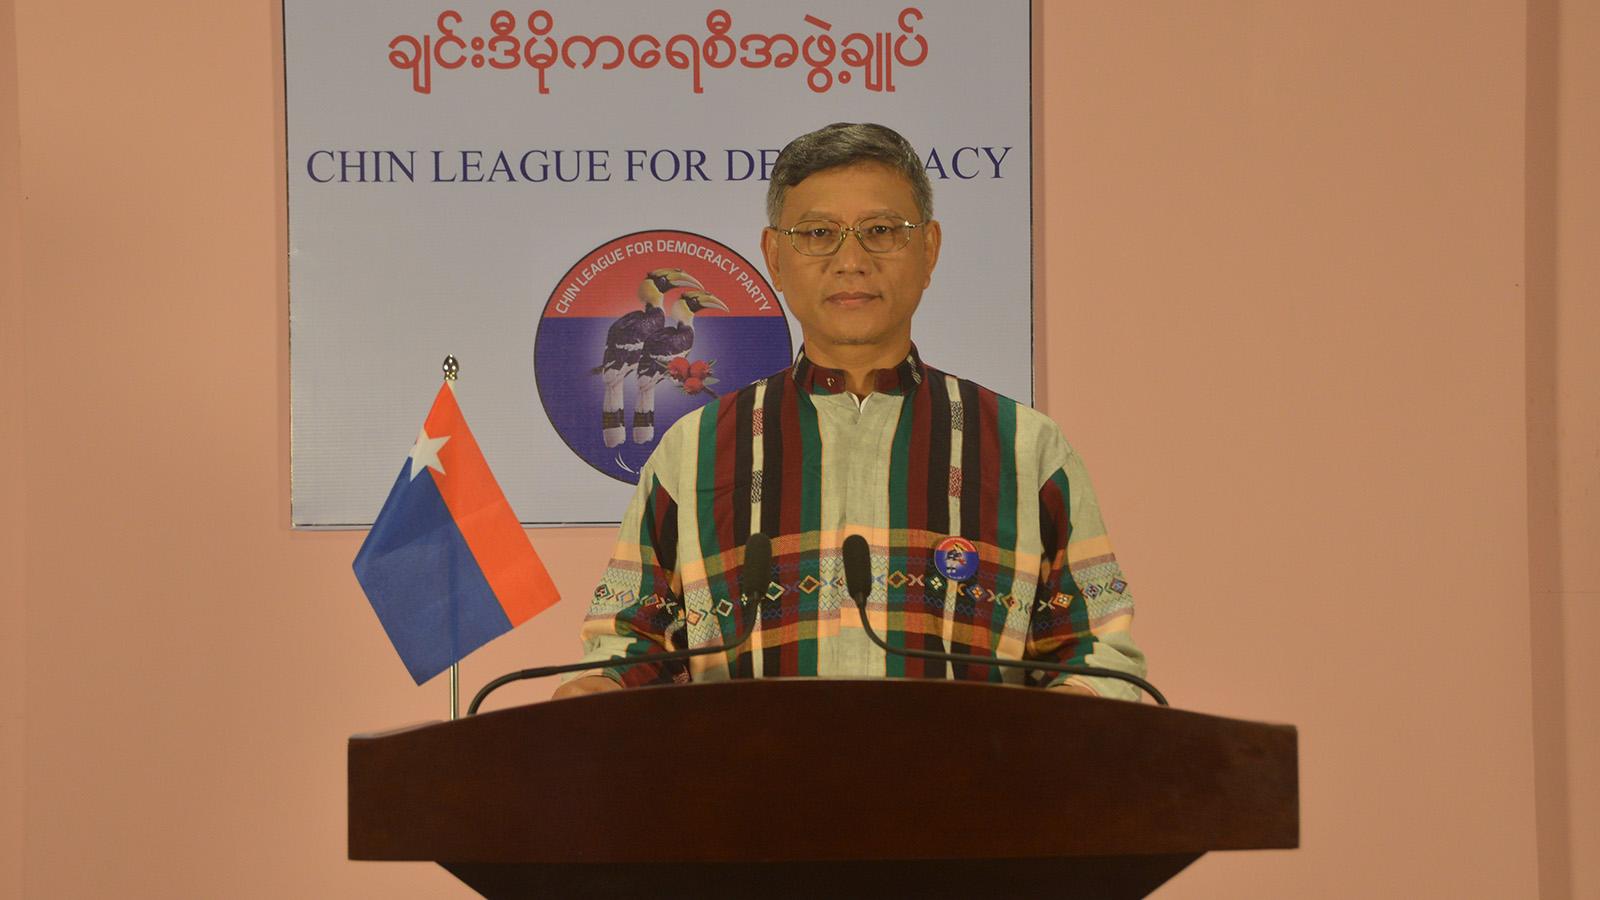 Salai Wom Za Pyaung, General Secretary of Chin League for Democracy Party.